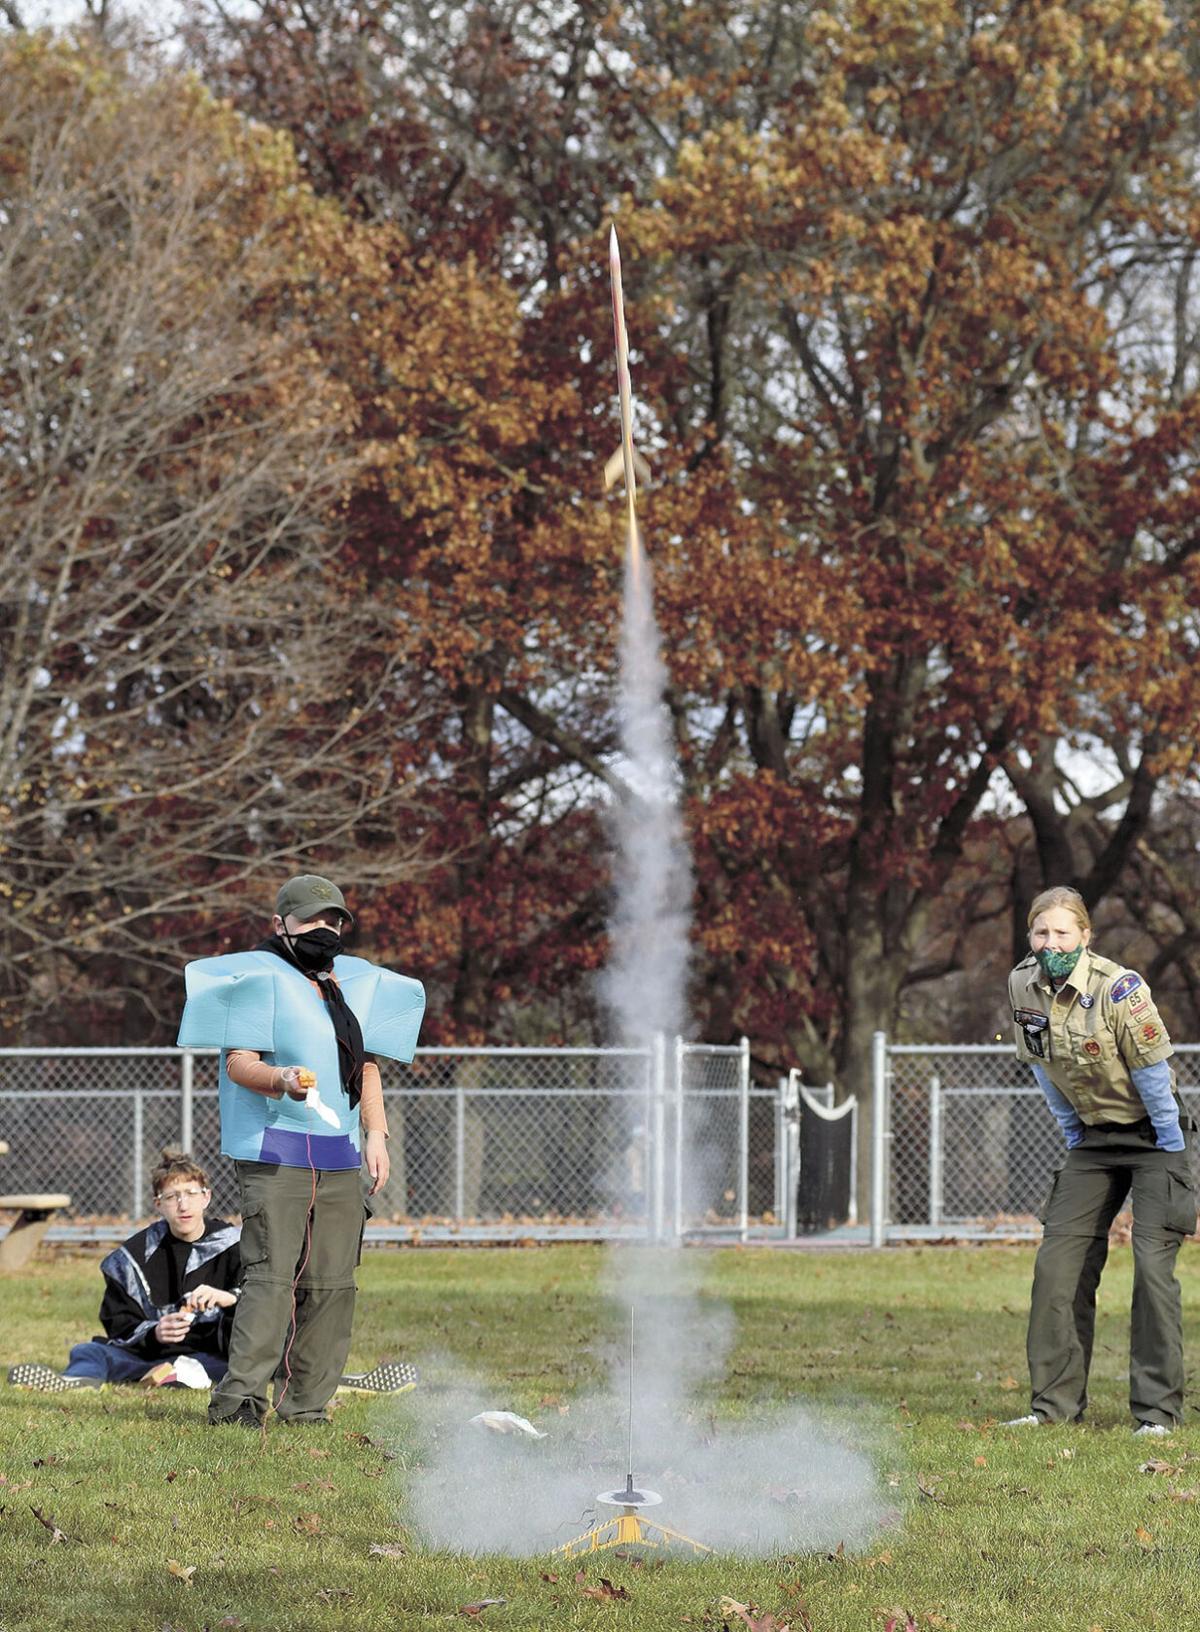 Scouting skills on display